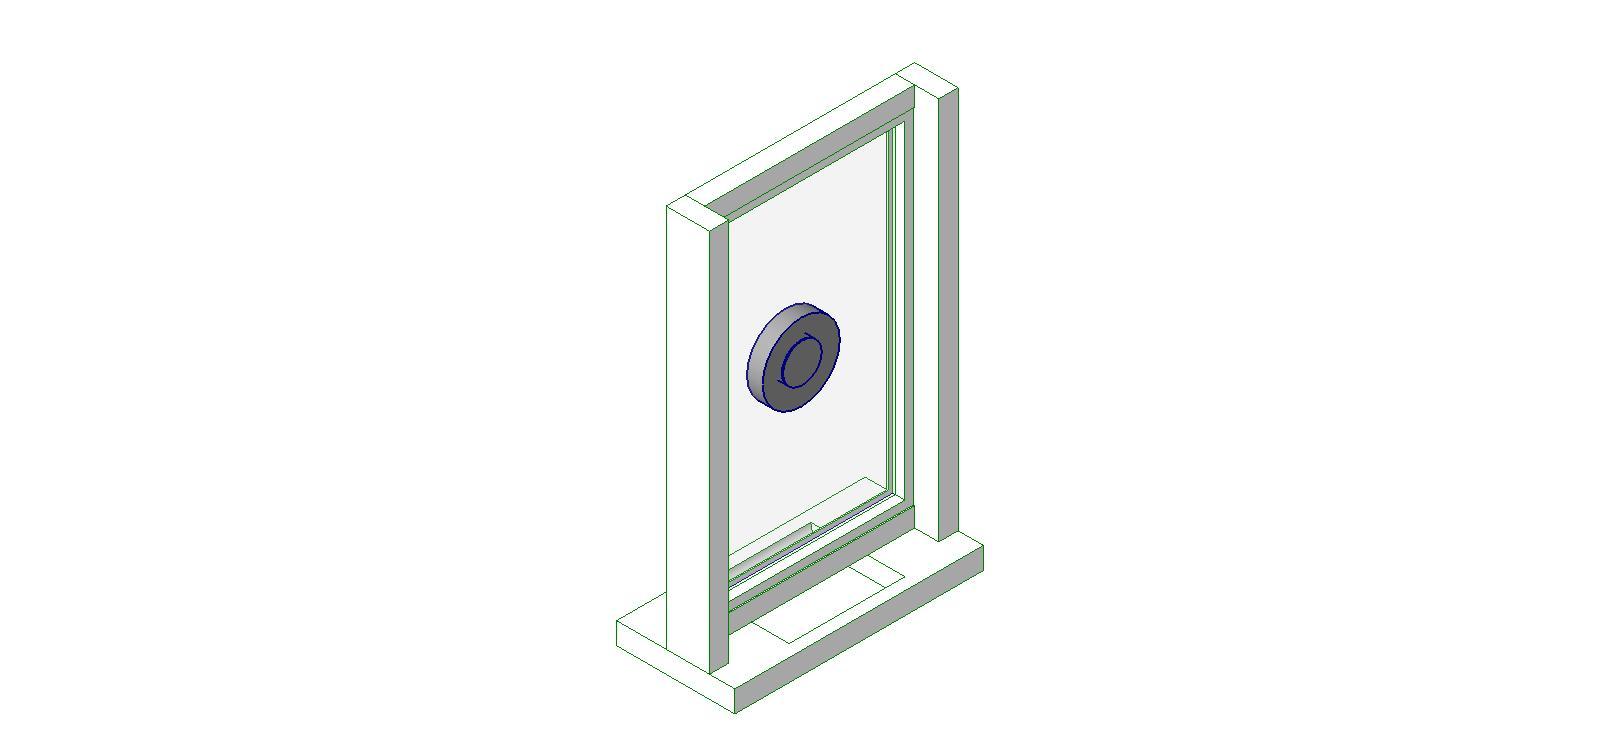 Ready Access Drive Thru Windows Pass Windows Bim Objects